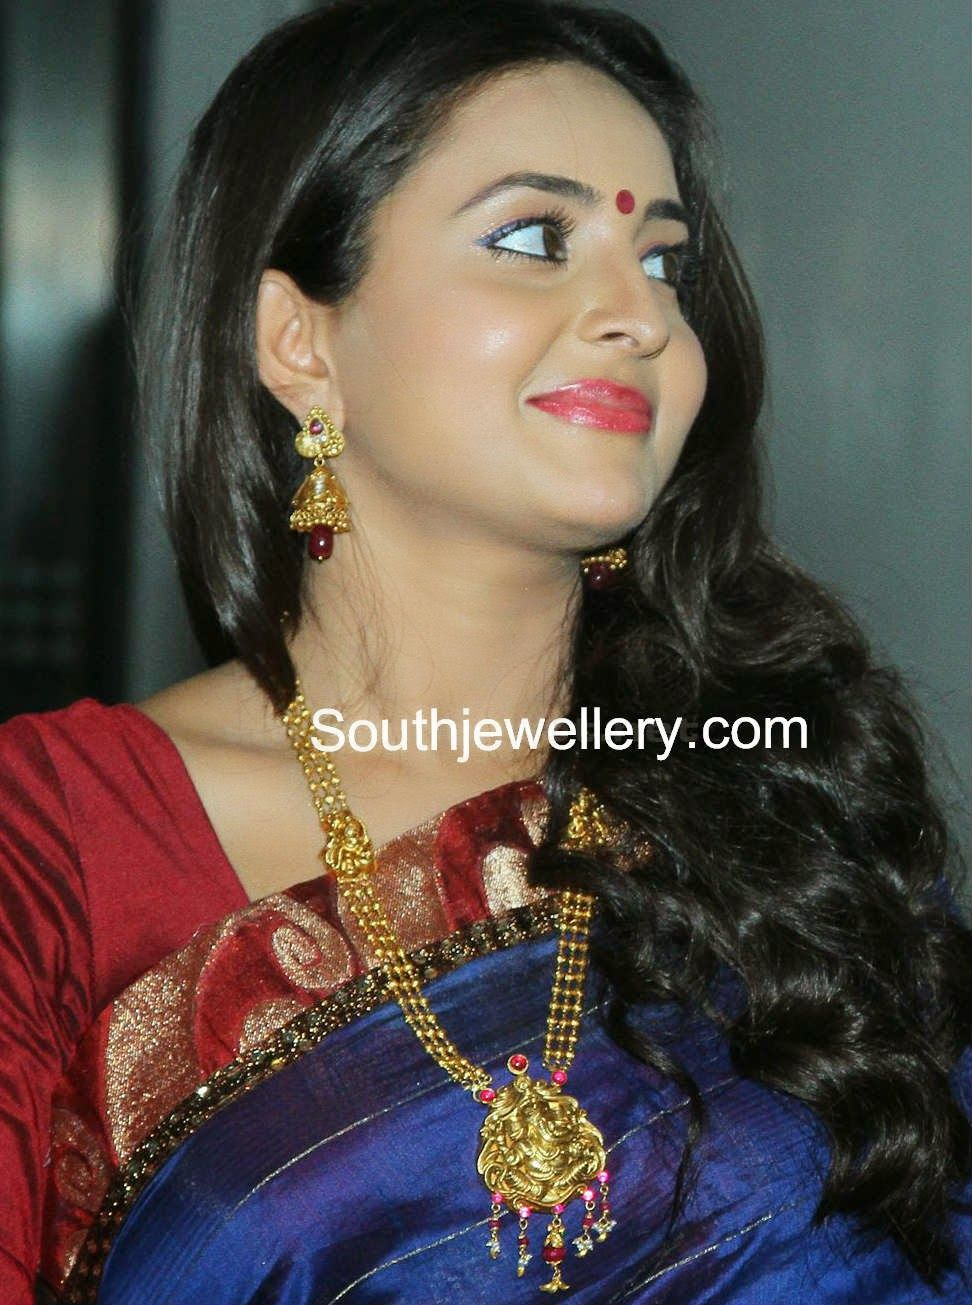 Suhasini in gundla haram jewellery designs - Gundla Haram Latest